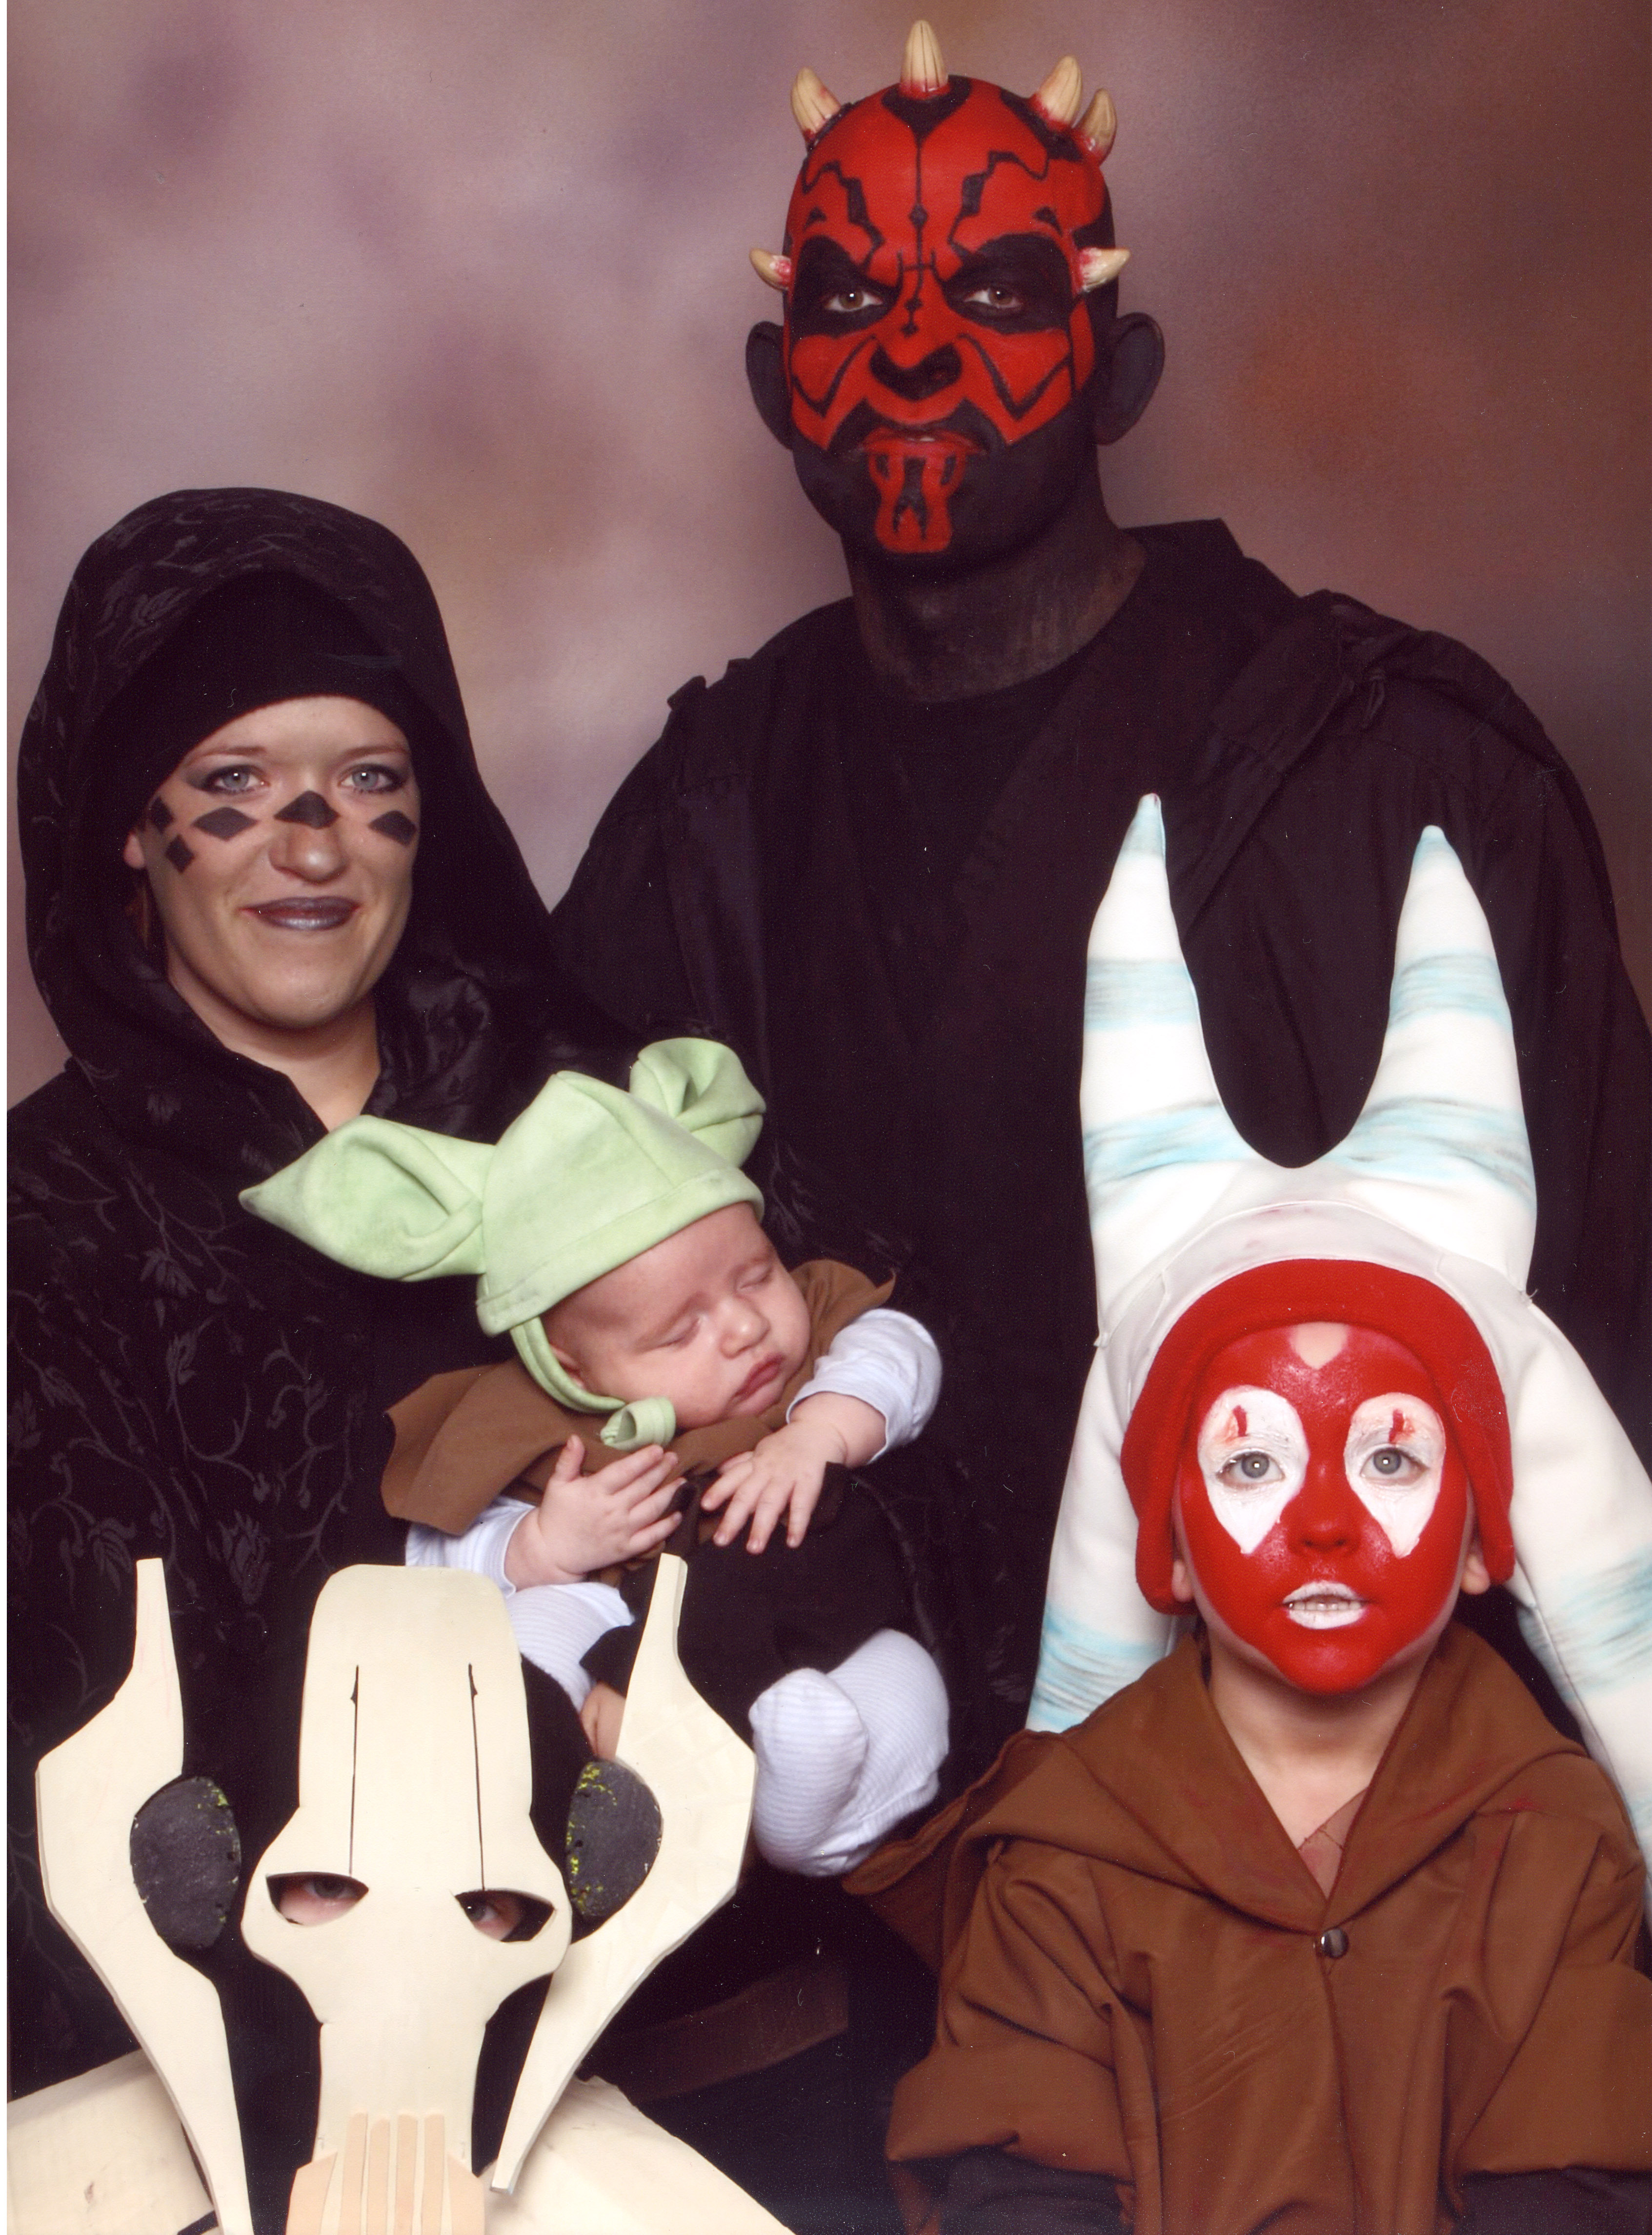 Best Halloween in a Galaxy Far, Far Away!